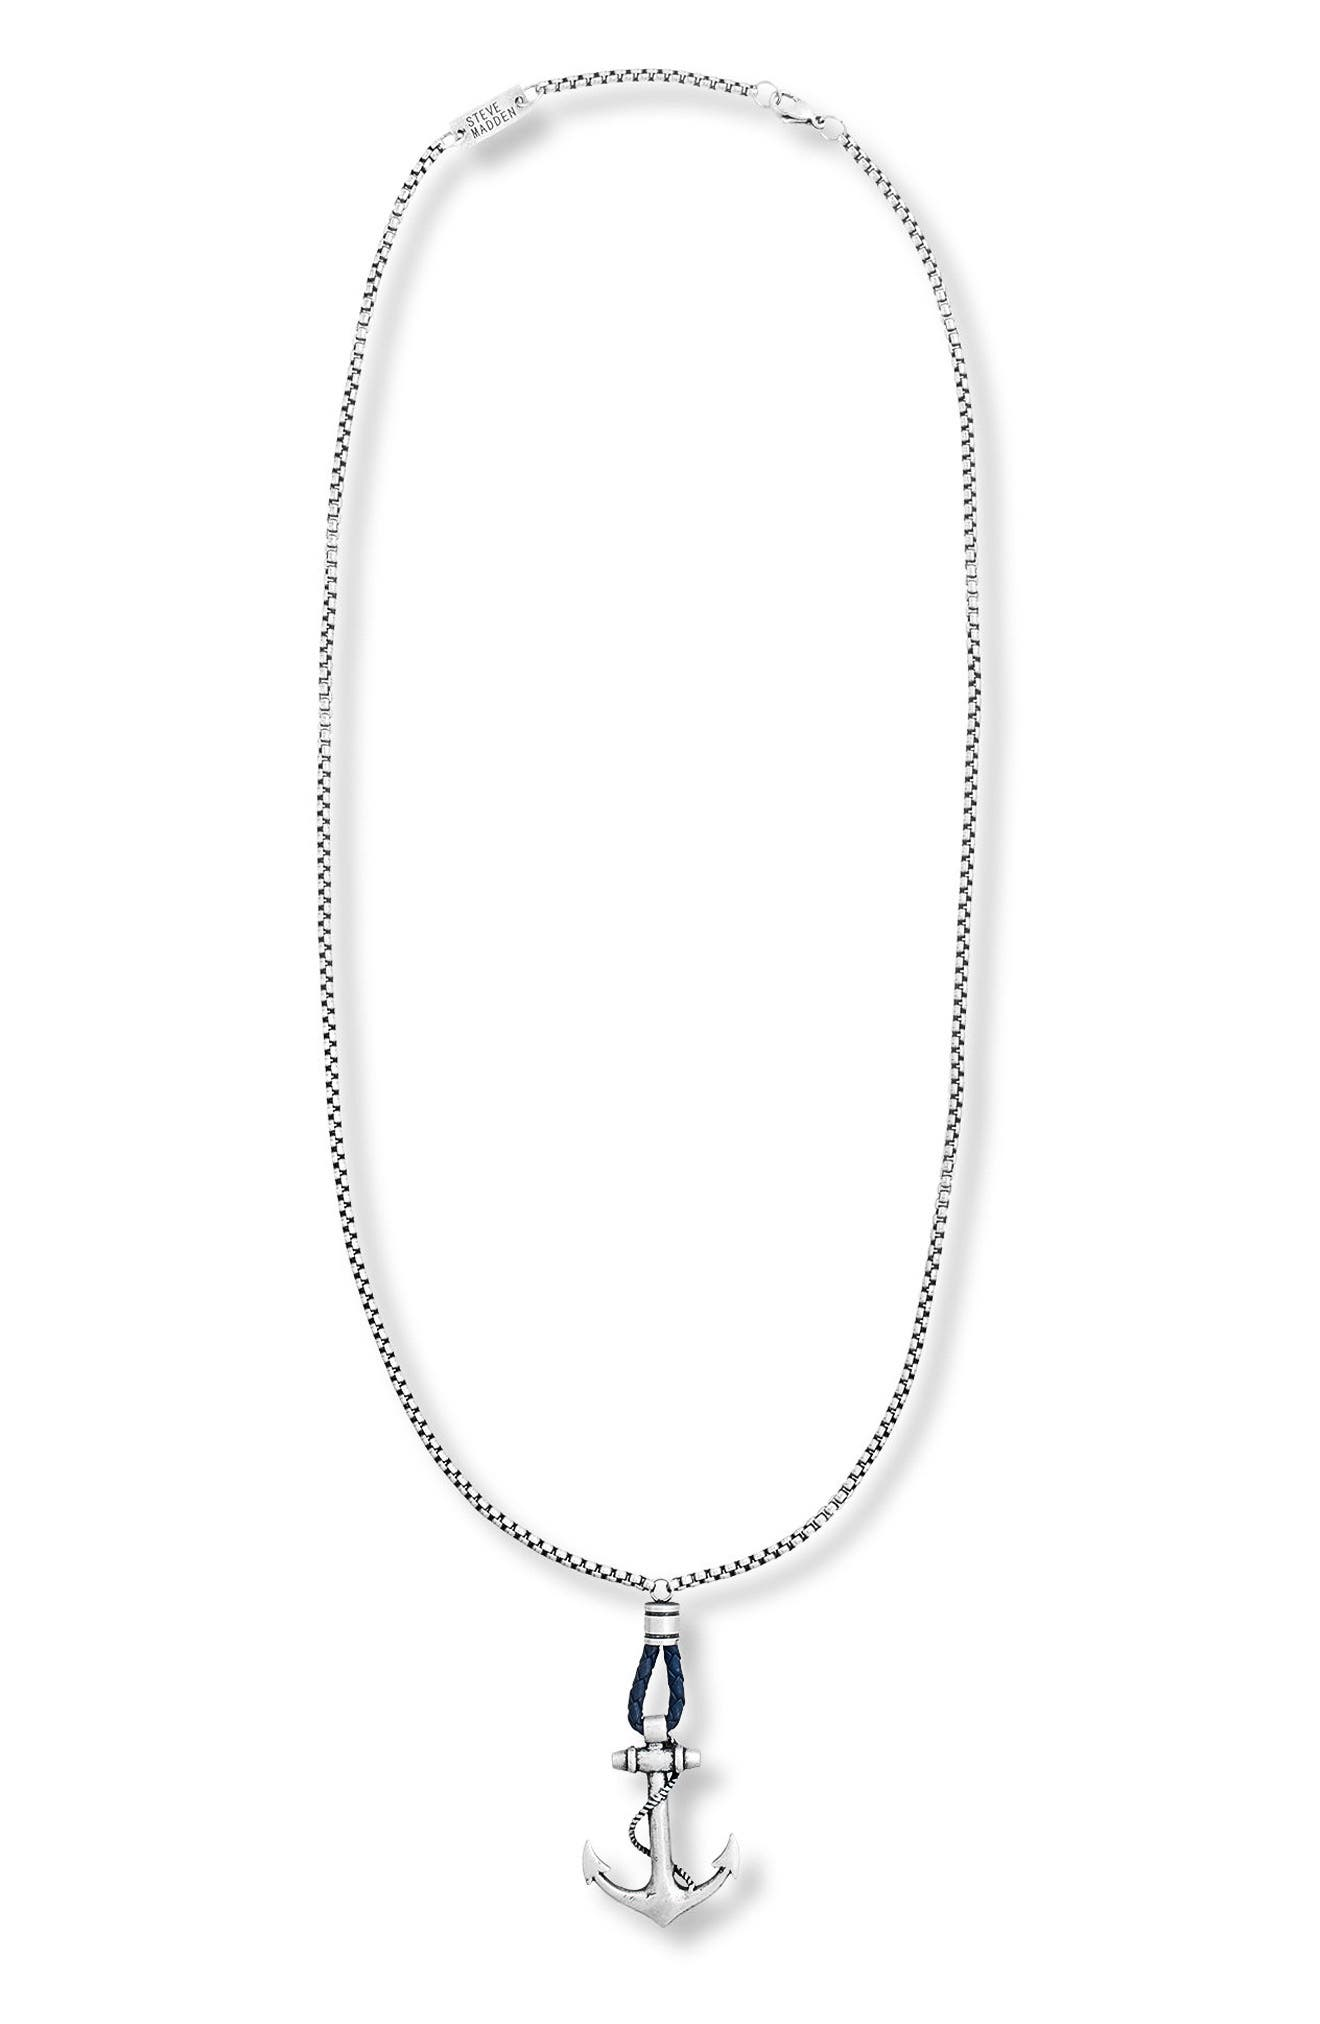 Main Image - Steve Madden Oxidized Anchor Pendant Necklace